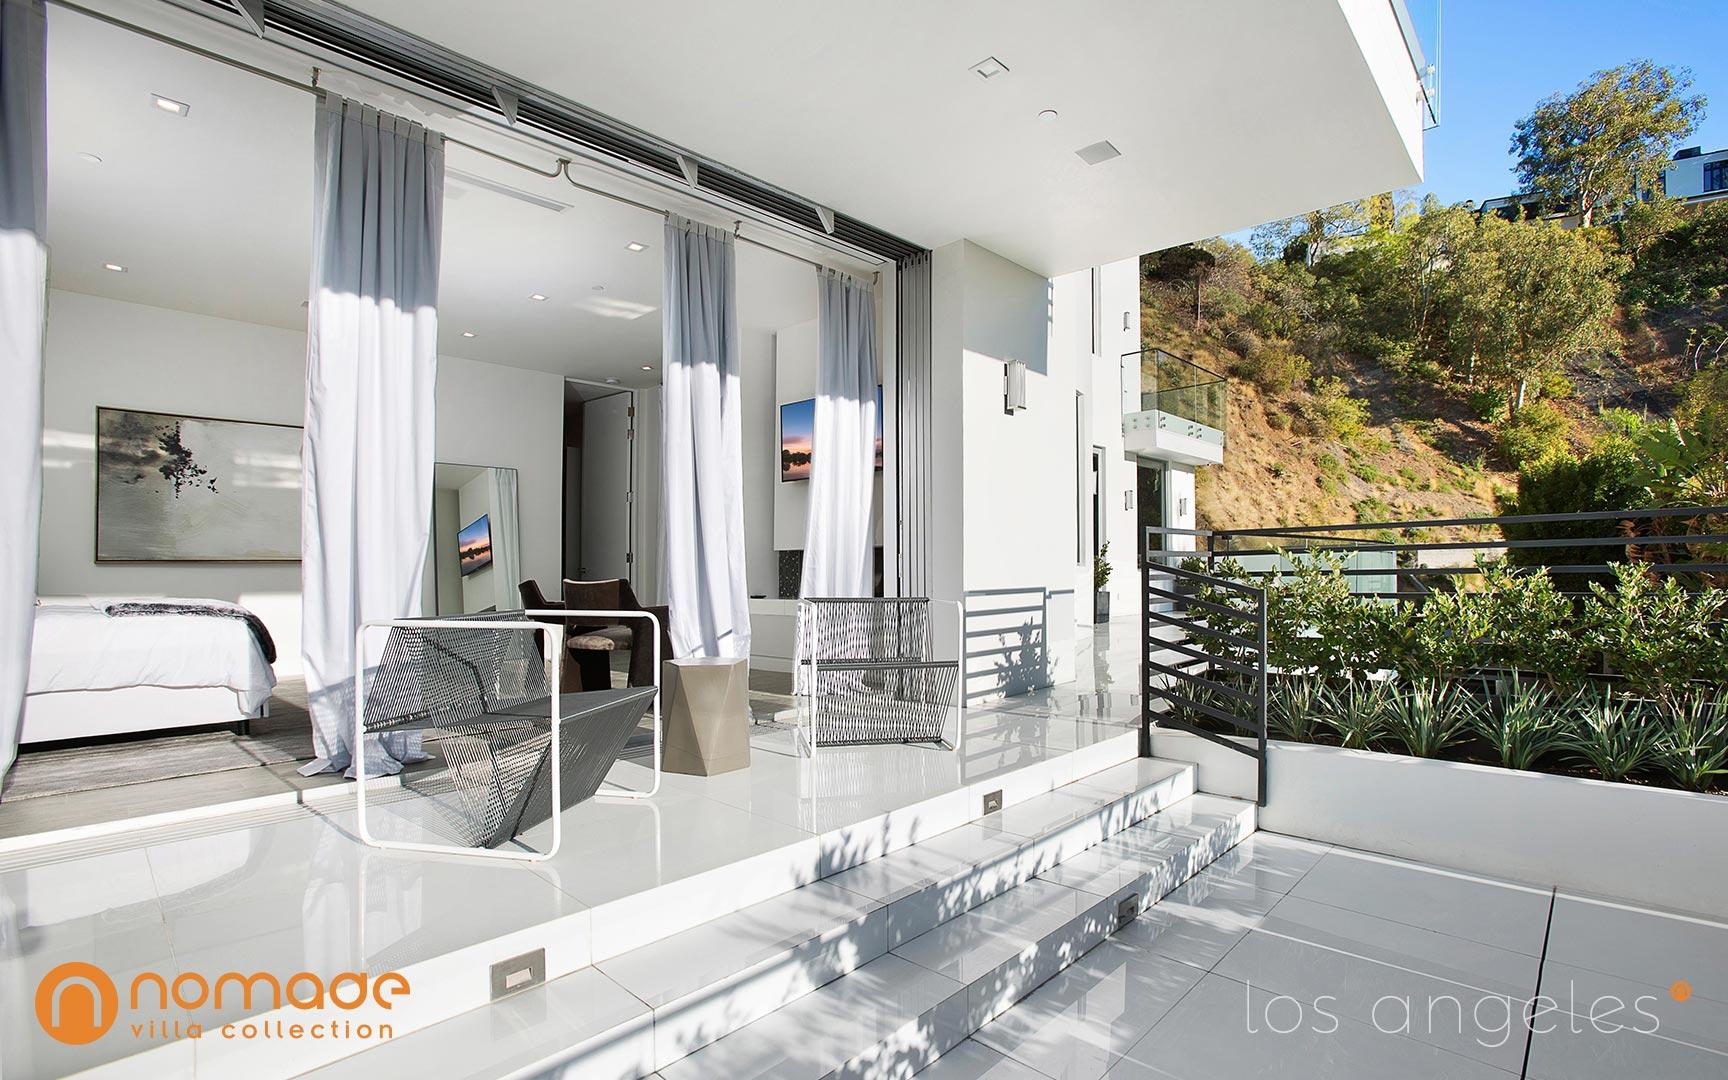 nomade-losangeles-BeverlyCrest-009